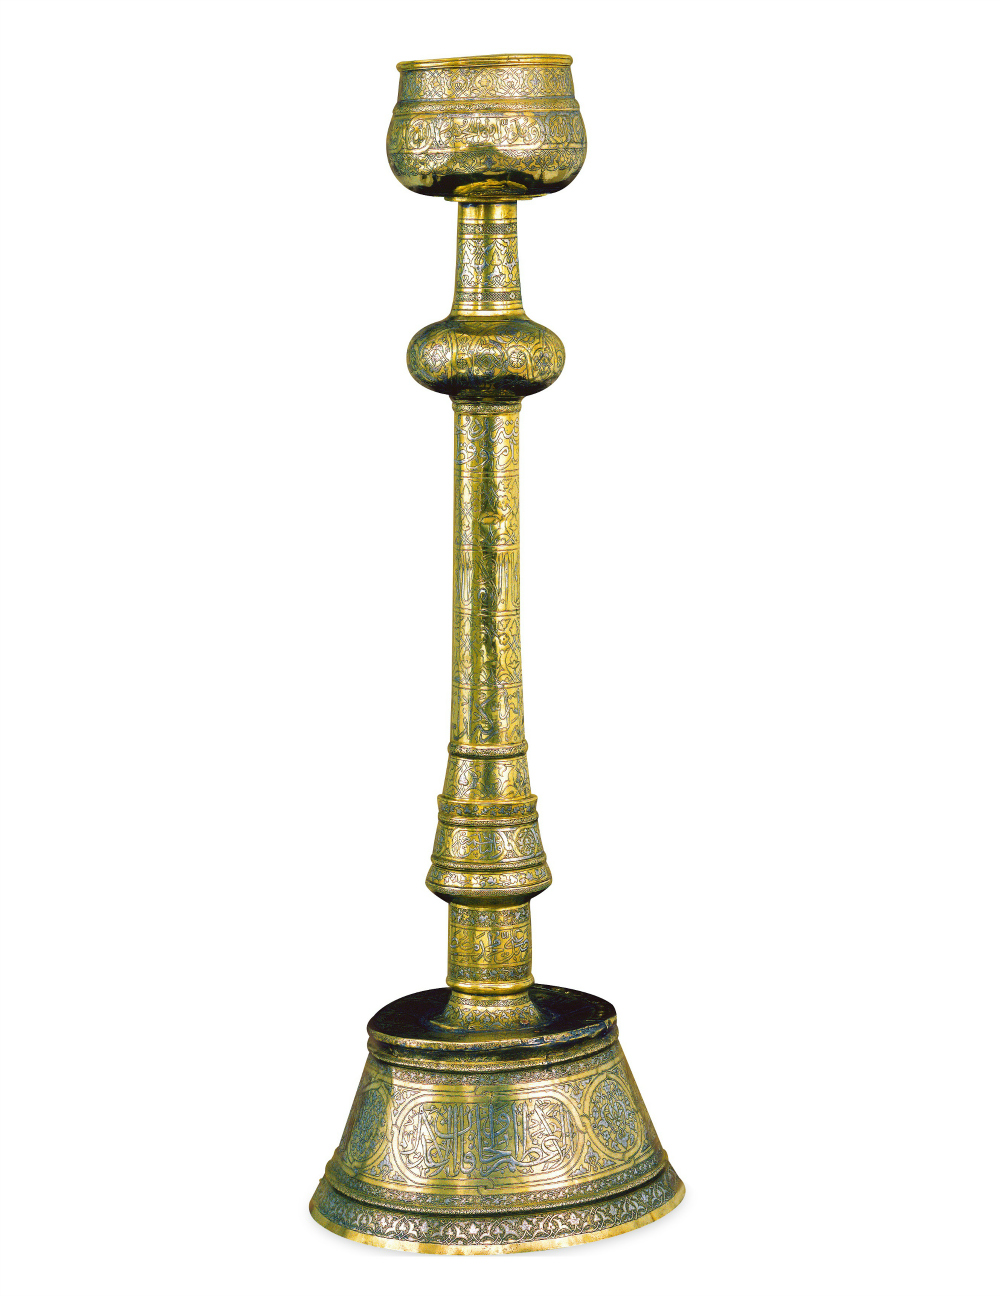 The Lamp of Haci Bayram Veli